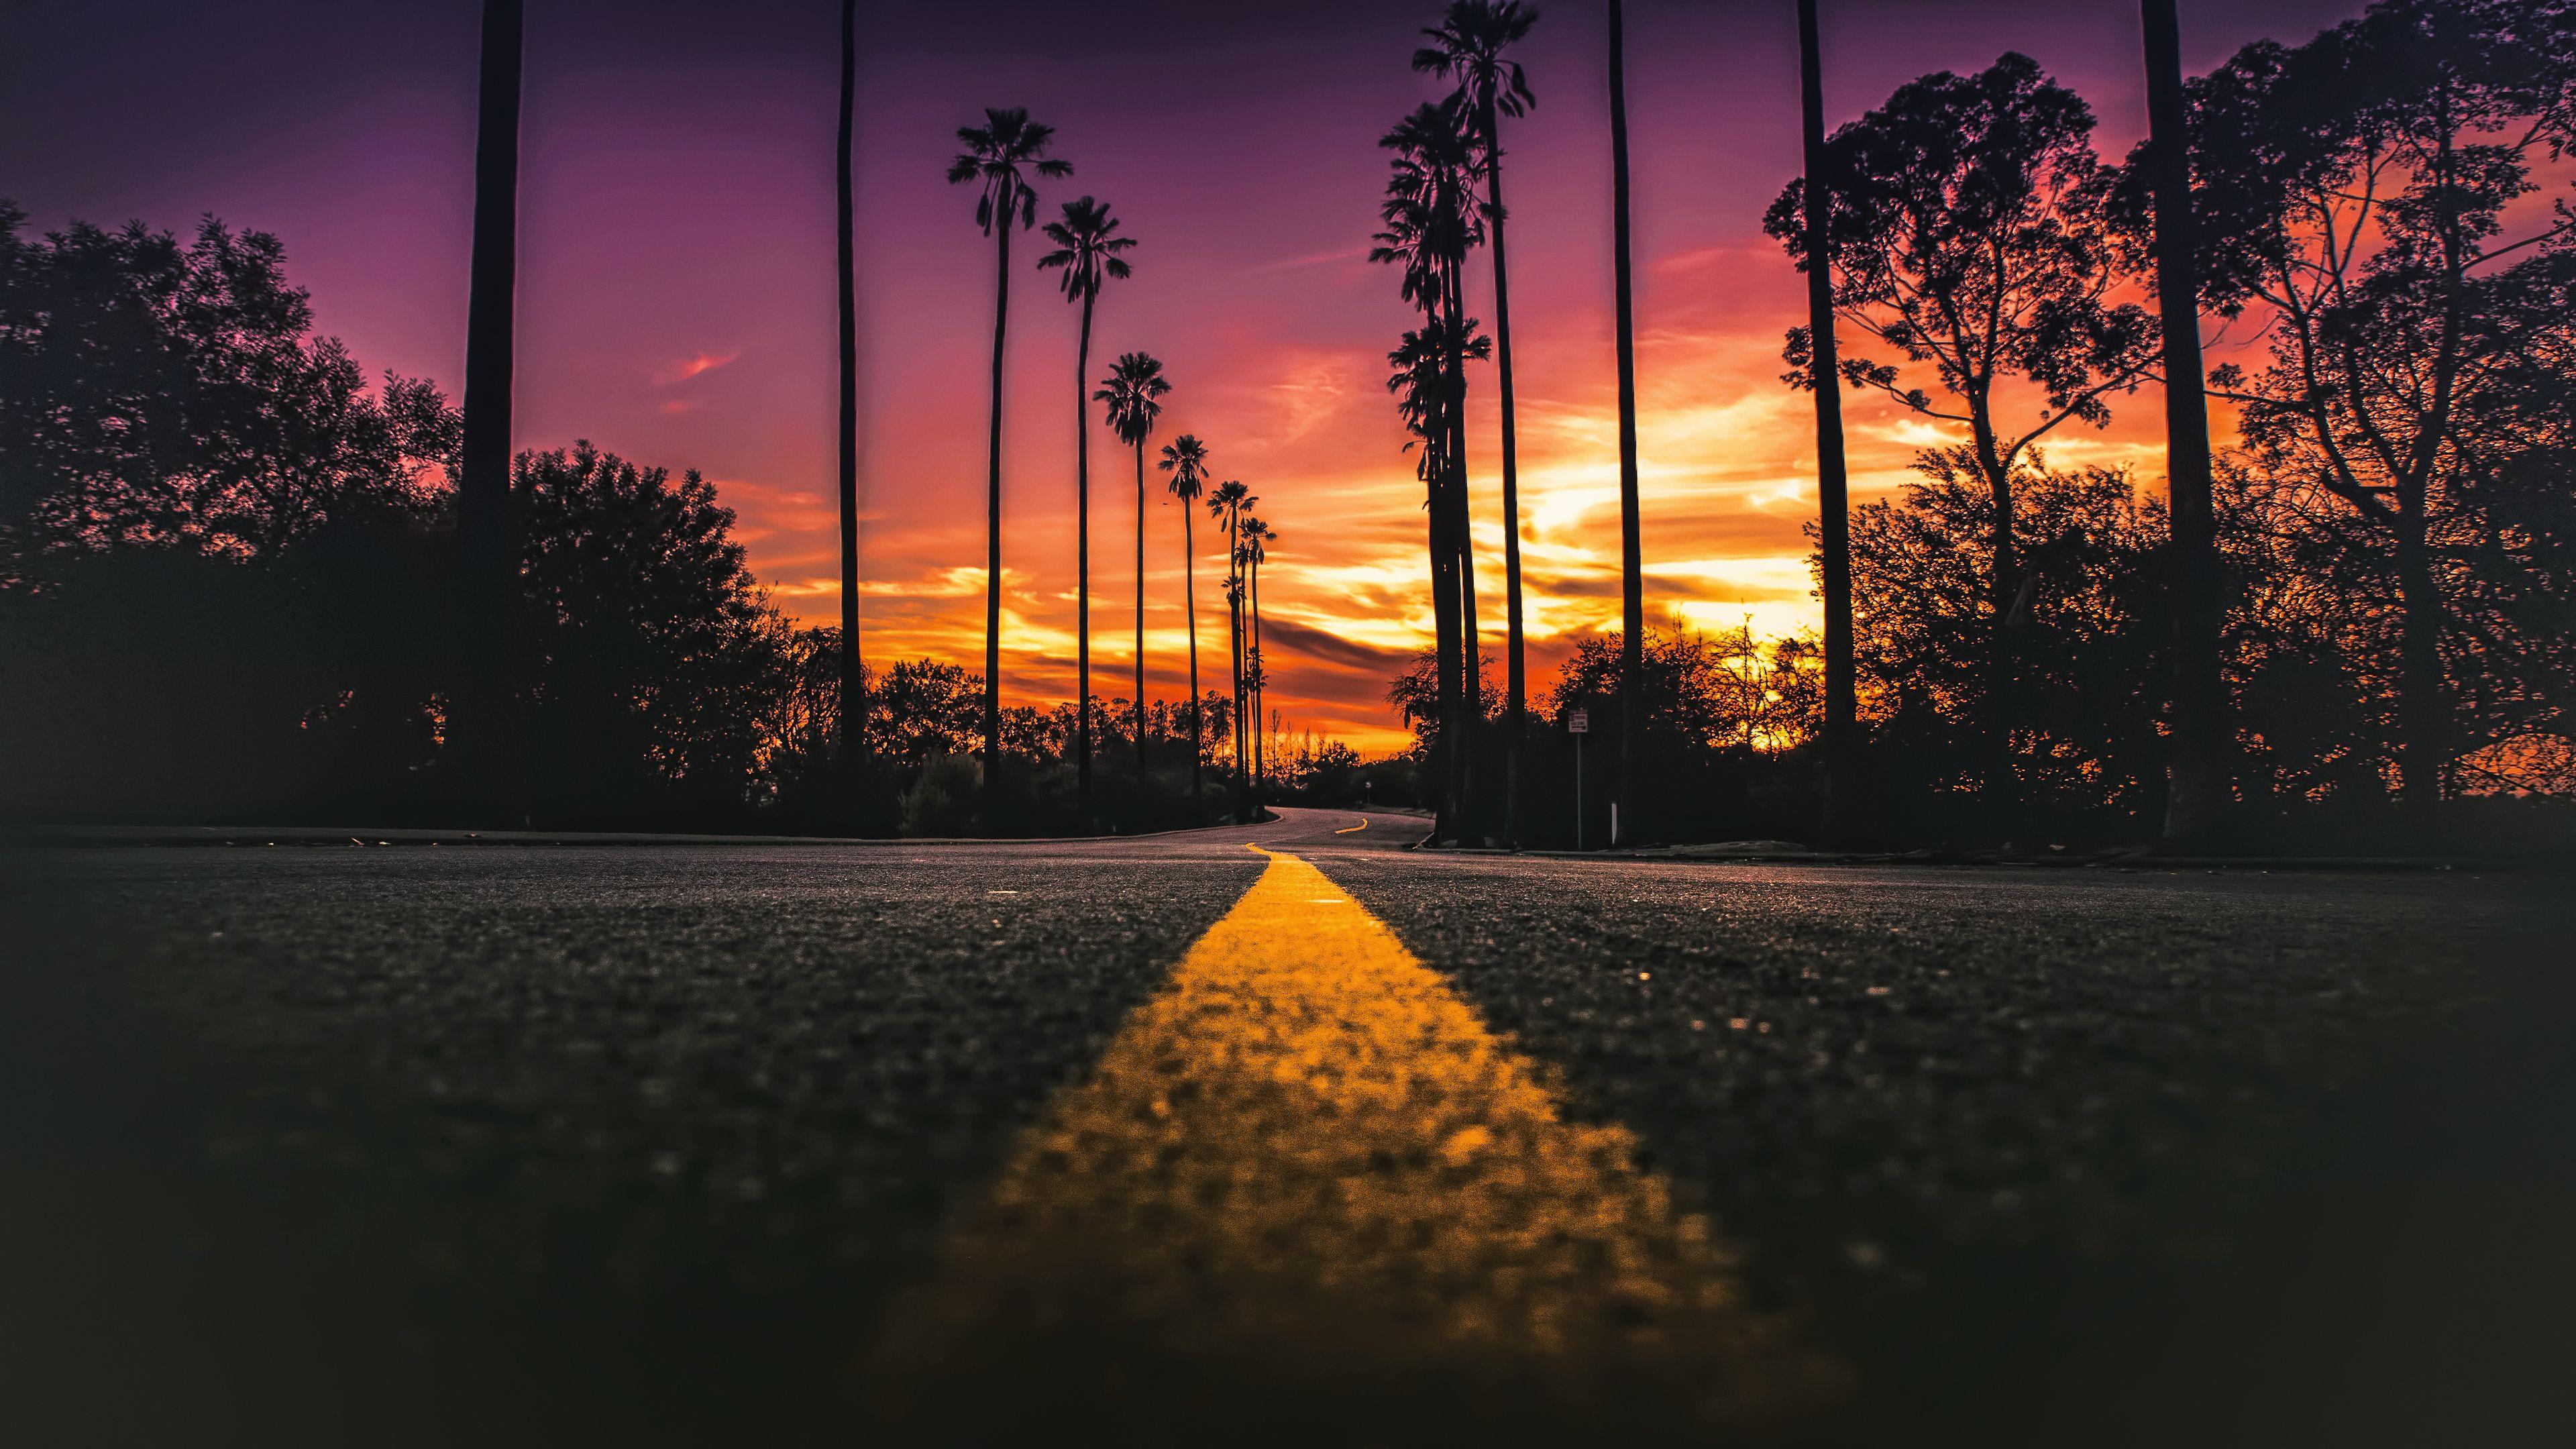 California 4K Wallpapers   Top California 4K Backgrounds 3840x2160